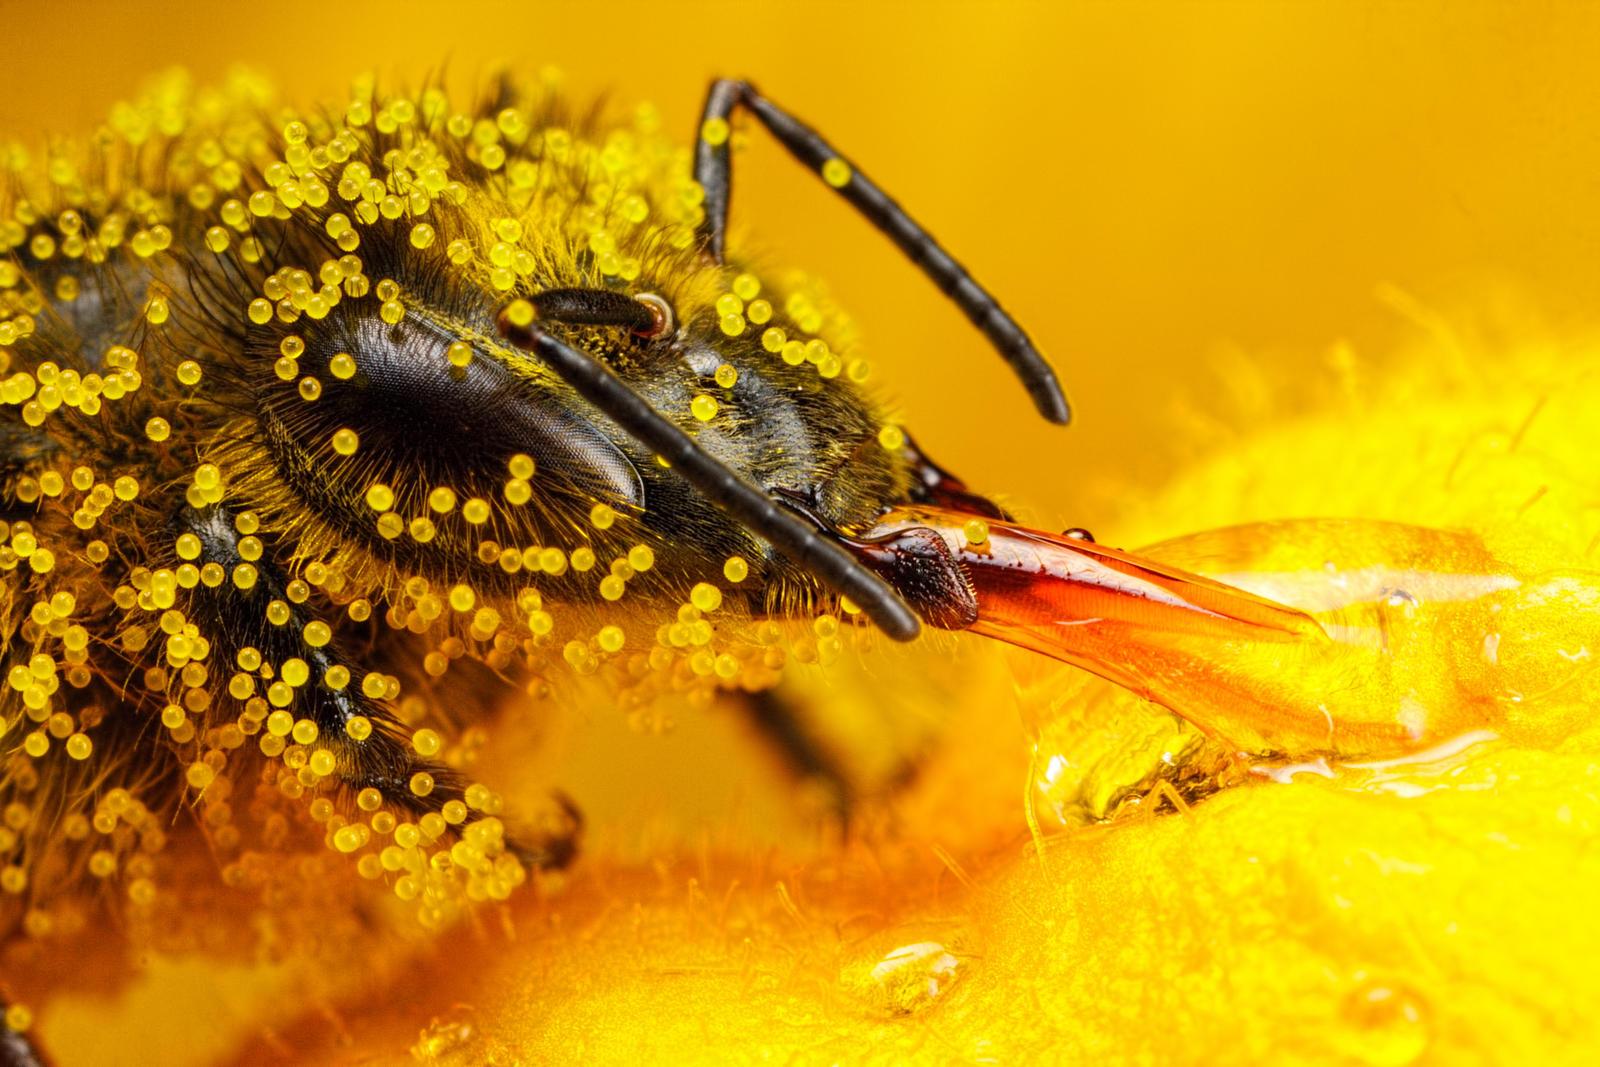 Honeybee Covered in Zucchini Pollen II by dalantech